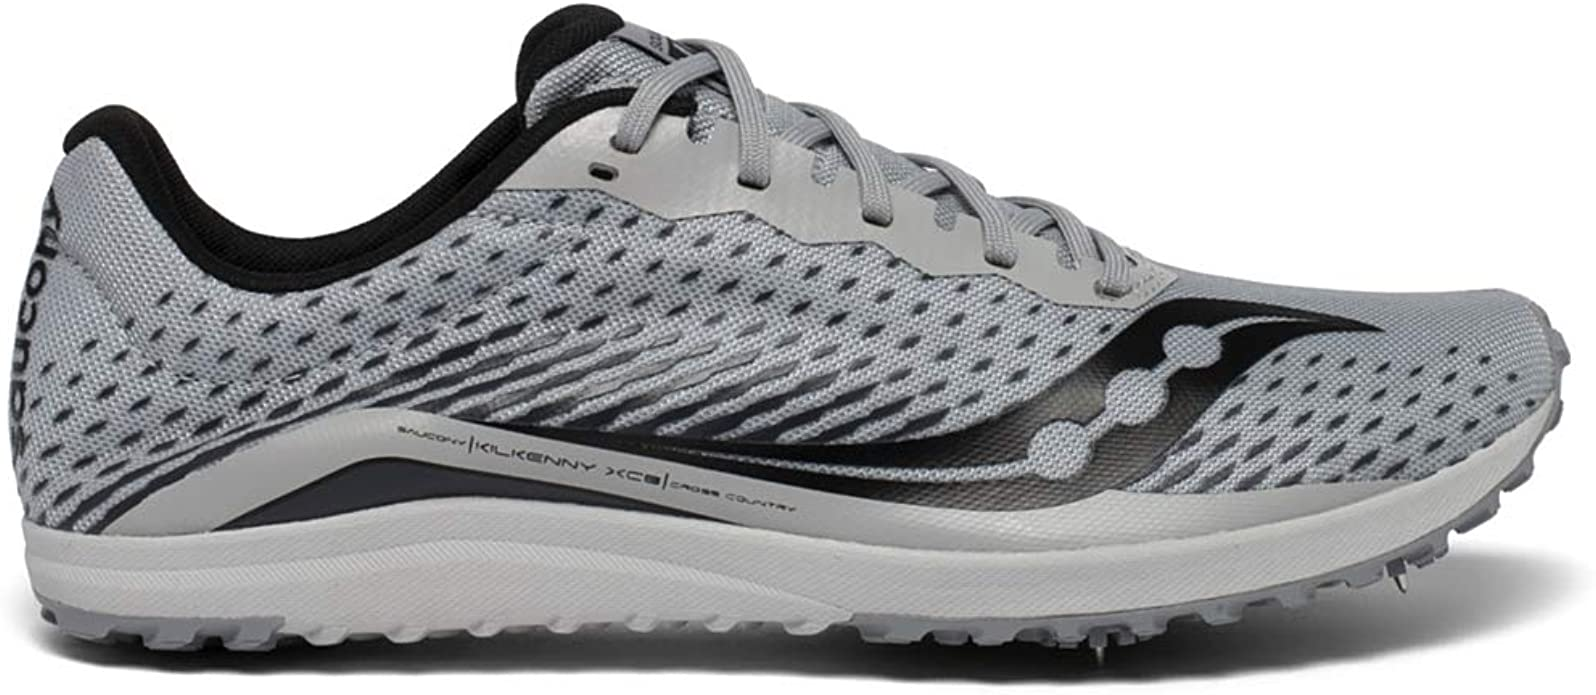 Amazon Com Saucony Women S Kilkenny Xc 8 Flat Cross Country Running Shoe Track Field Cross Country